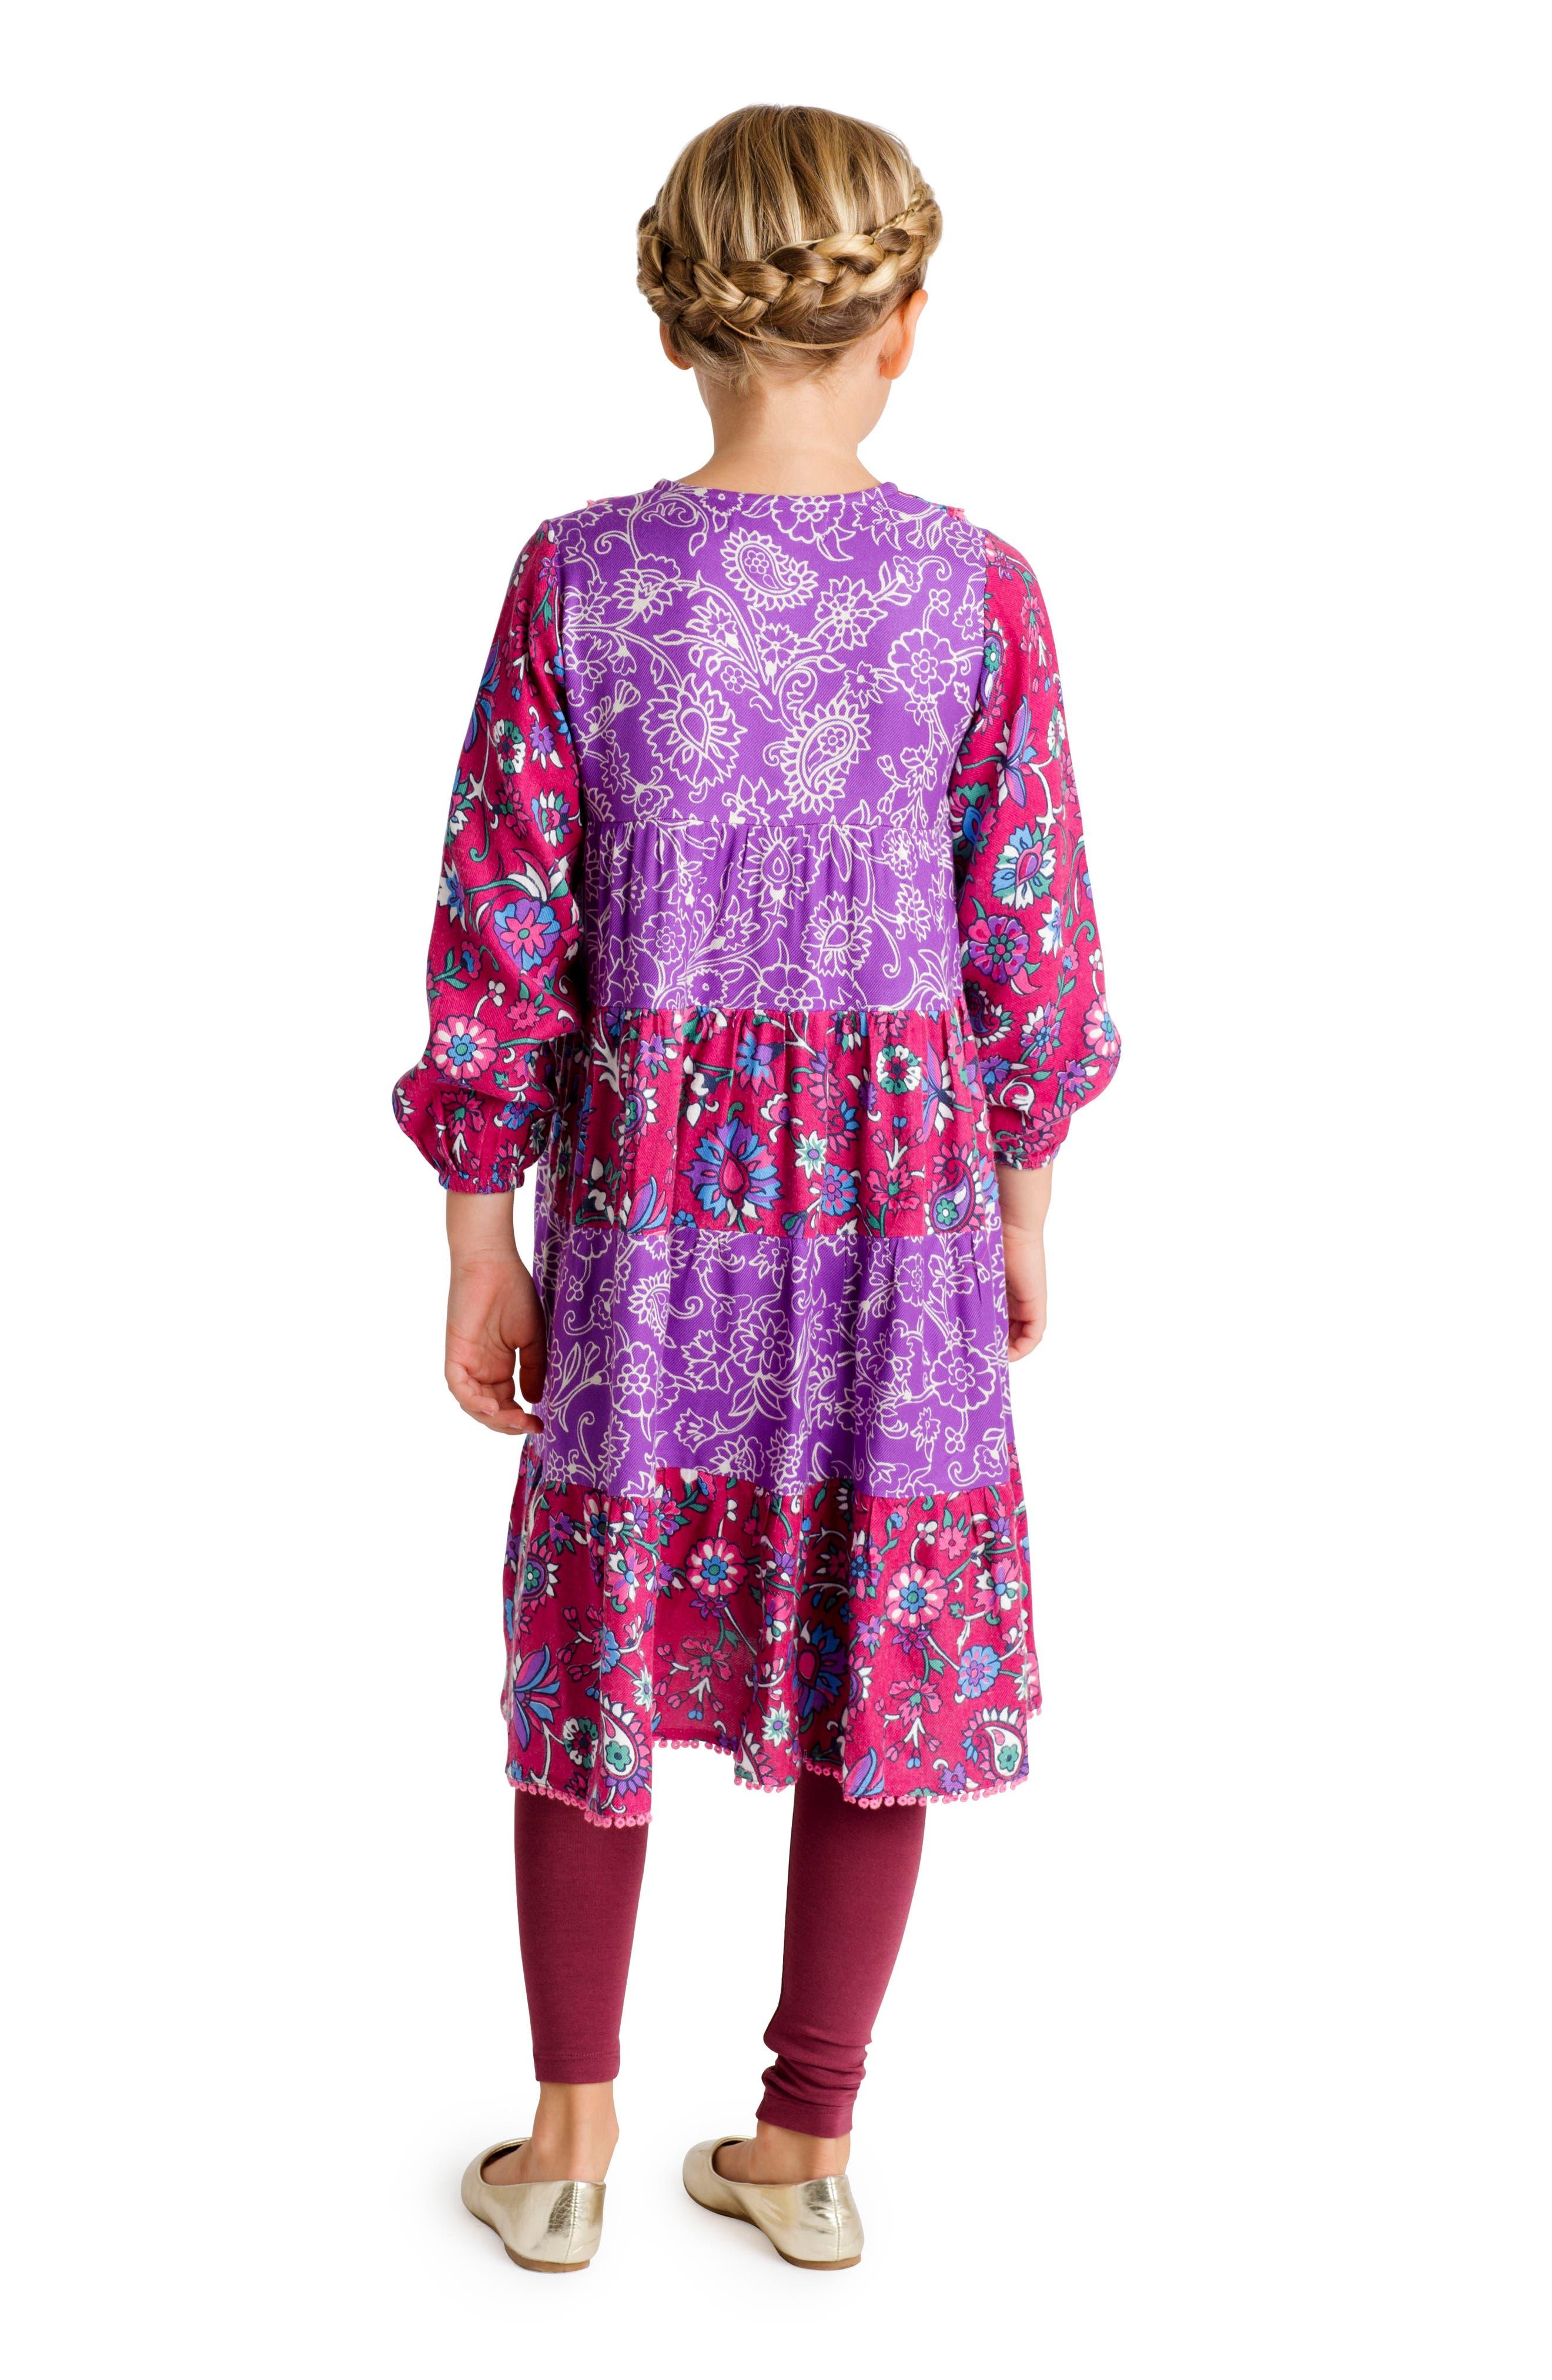 Tiered Floral Dress,                             Alternate thumbnail 3, color,                             Purple Multi